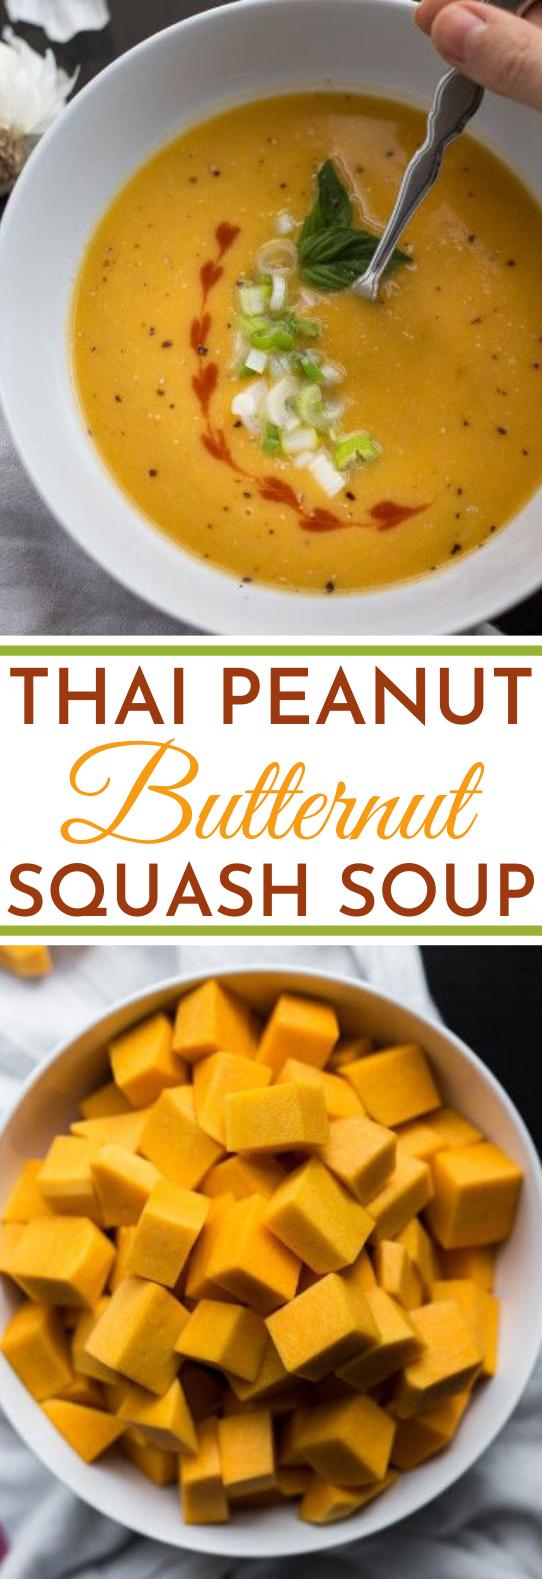 Thai Peanut Butternut Squash Soup #vegetarian #soup #dinner #comfortfood #vegan